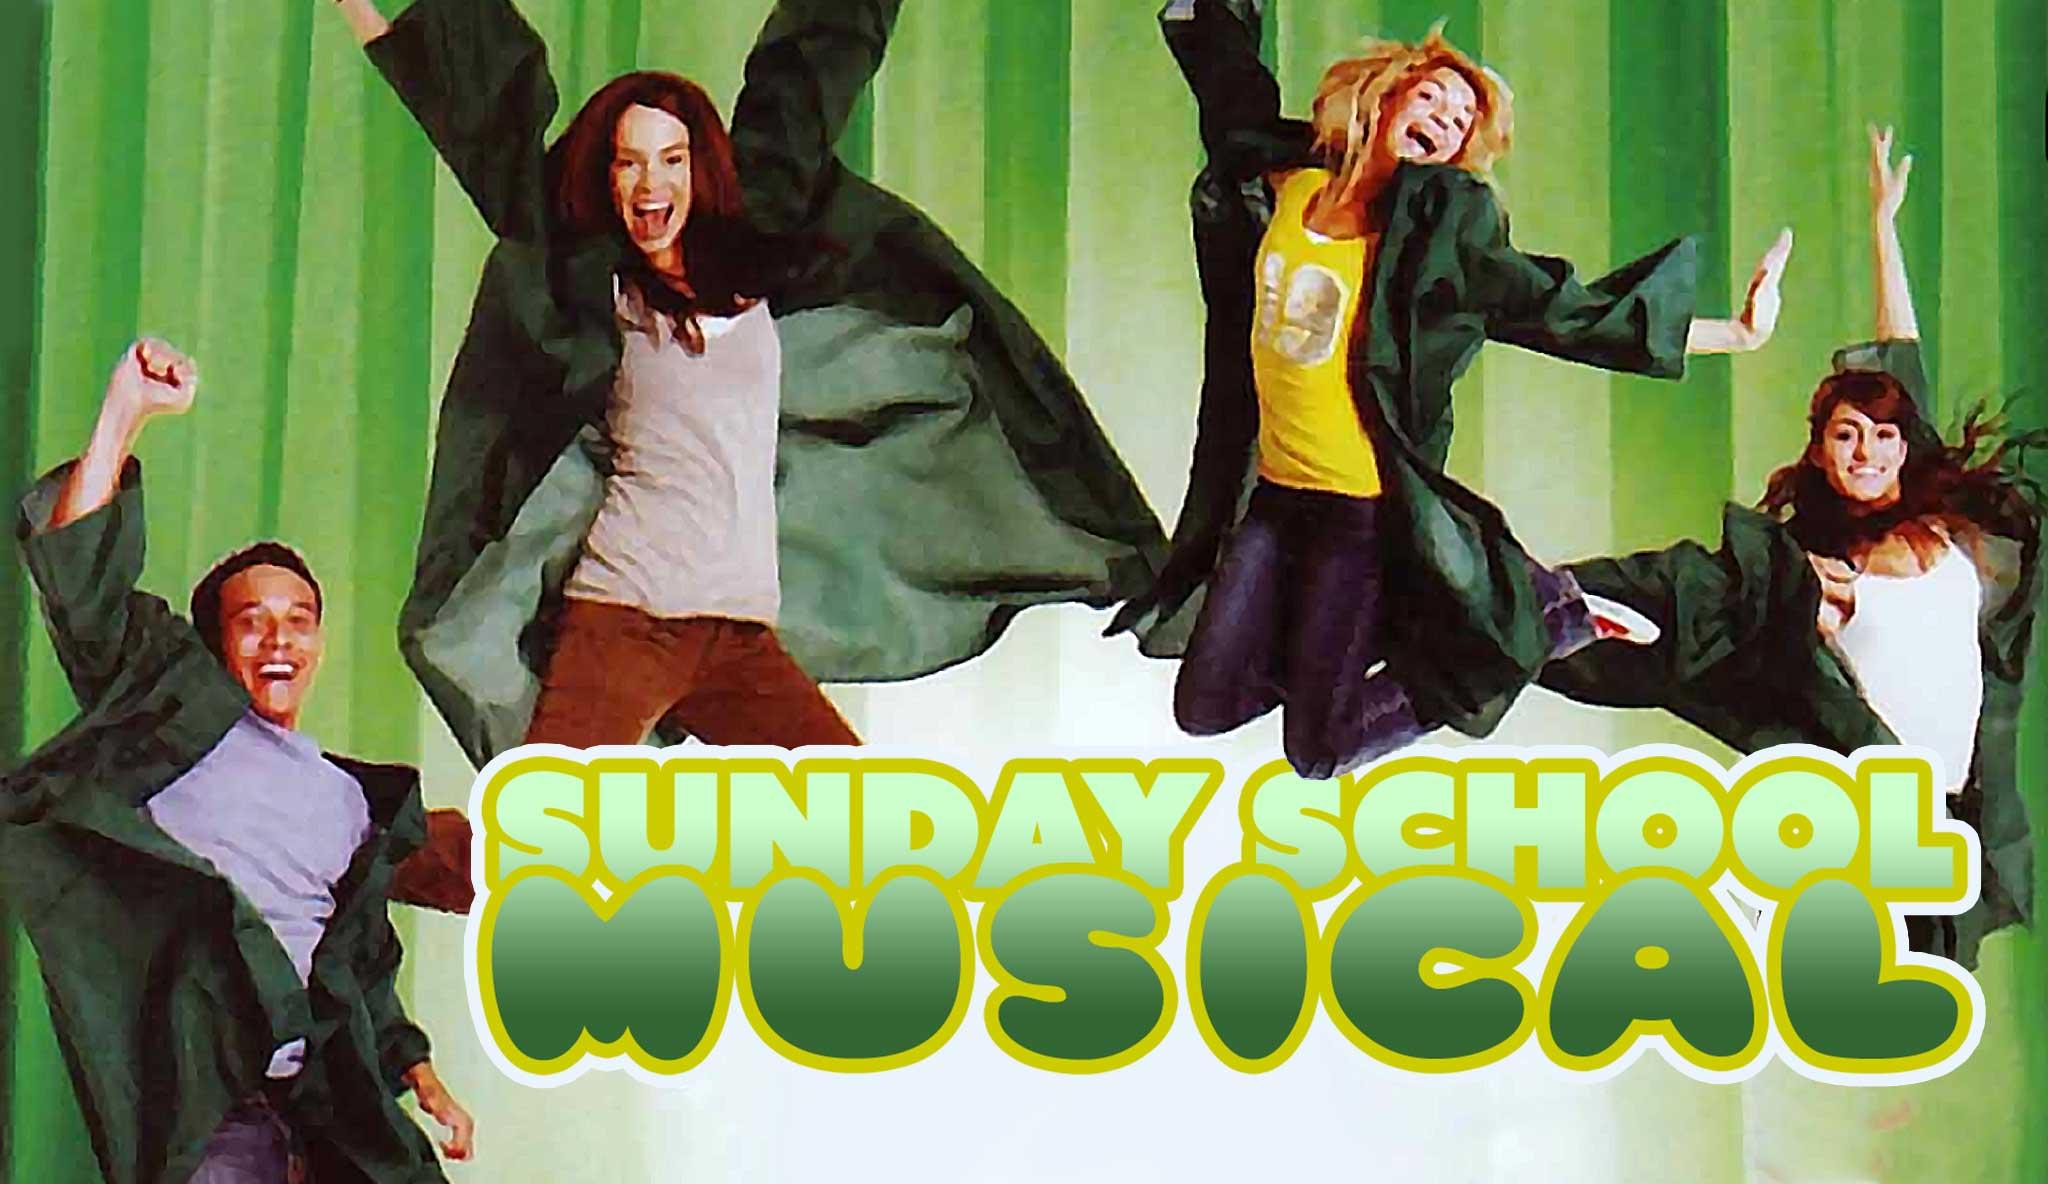 sunday-school-musical\header.jpg